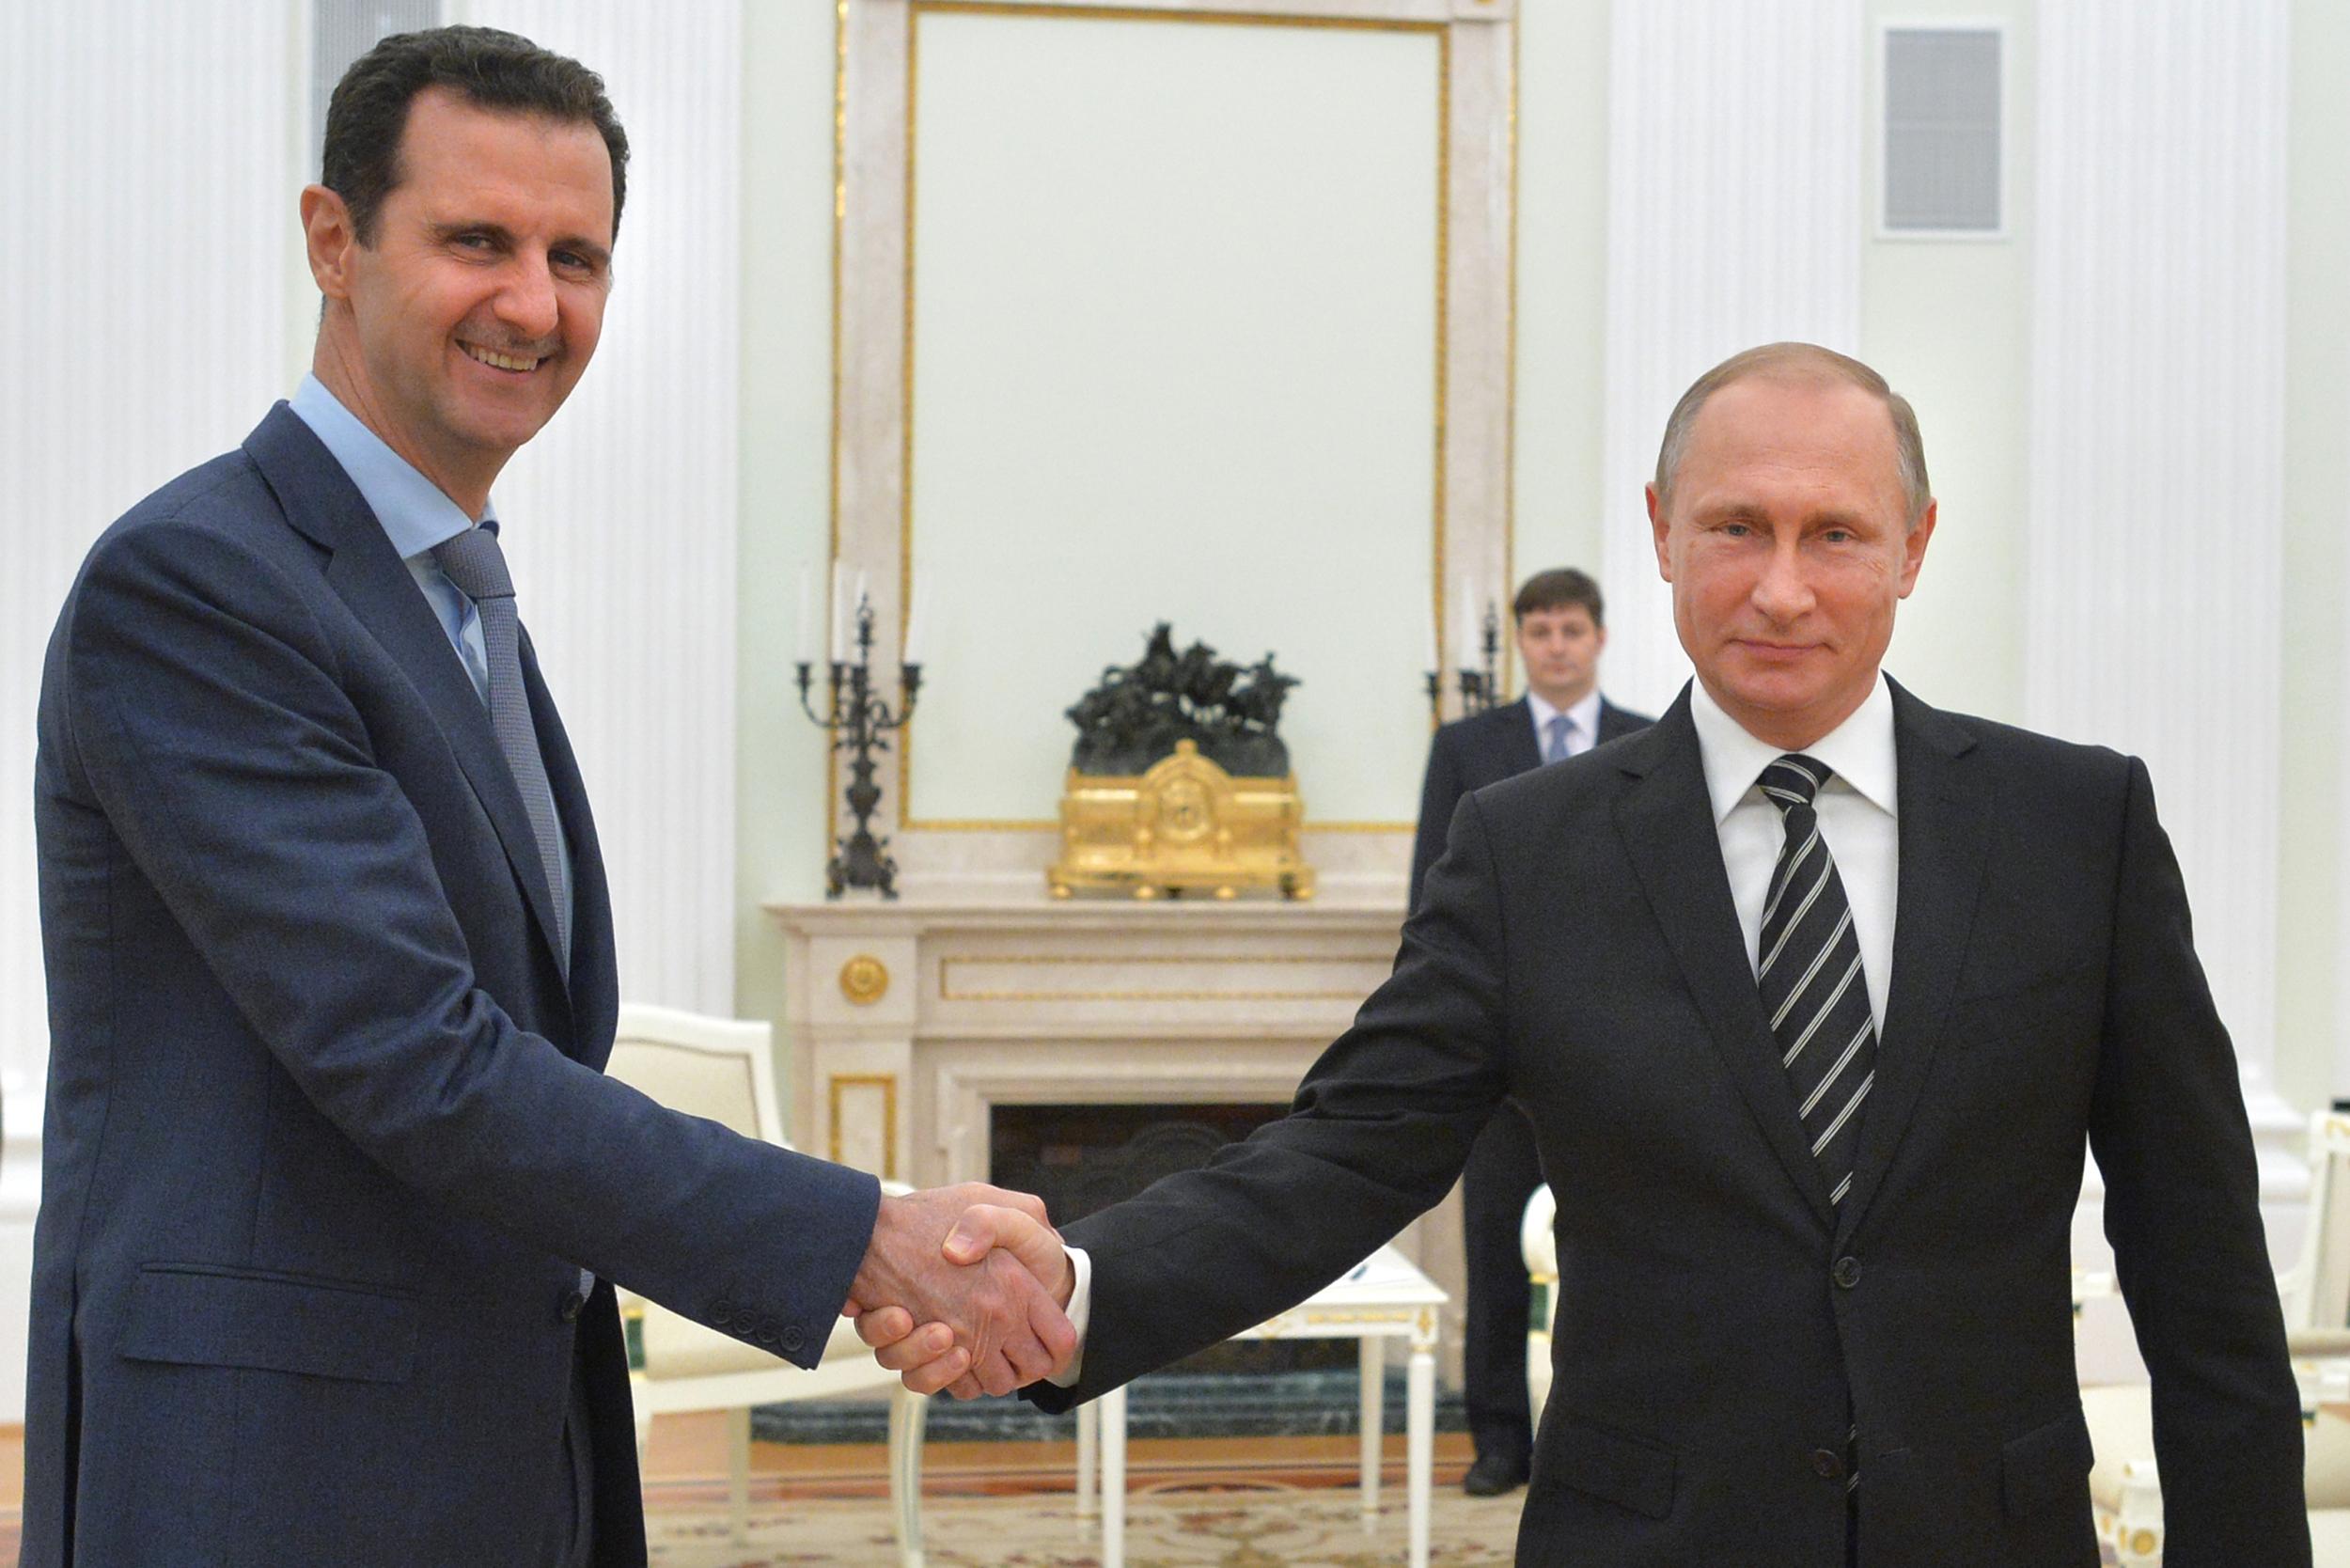 In this photo taken on Tuesday, Oct. 20, 2015, Russian President Vladimir Putin, right, shakes hand with Syria's President Bashar al-Assad in the Kremlin in Moscow, Russia. (Alexei Druzhinin, RIA-Novosti, Kremlin Pool Photo via AP)